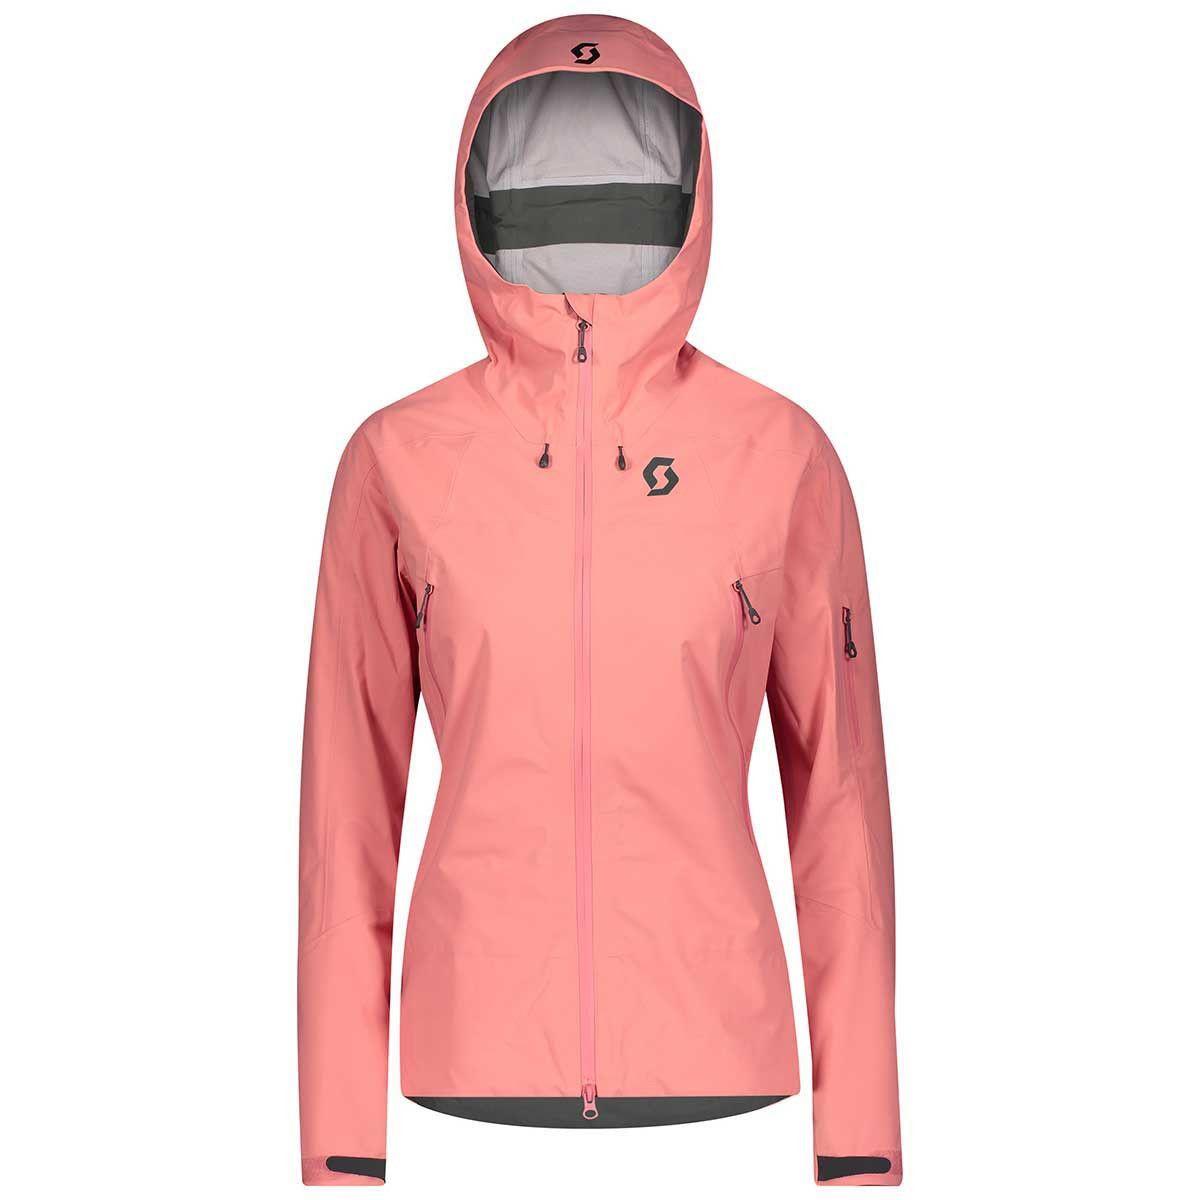 Scott Explorair 3l Jacket Women S Ski Fashion Womens Jackets For Women Jackets [ 1200 x 1200 Pixel ]